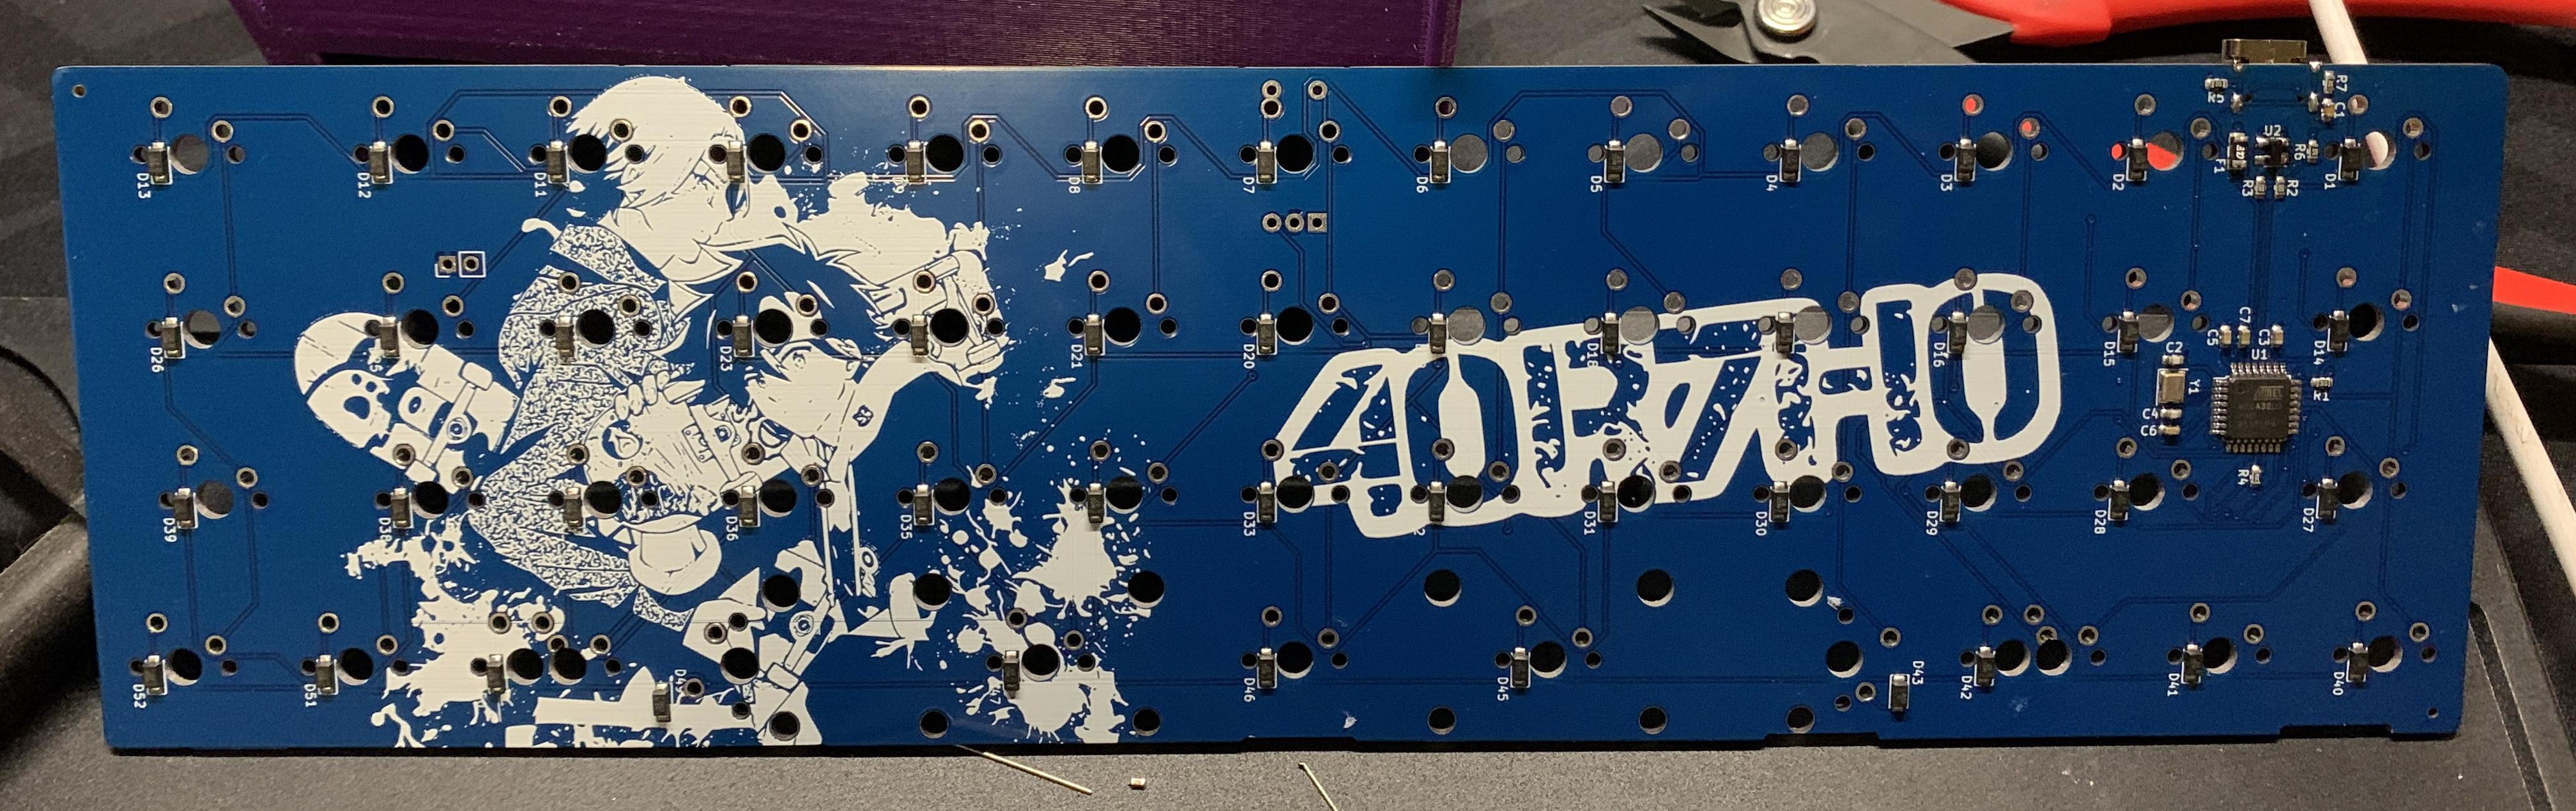 Back of a rev 1 40R7H0 PCB